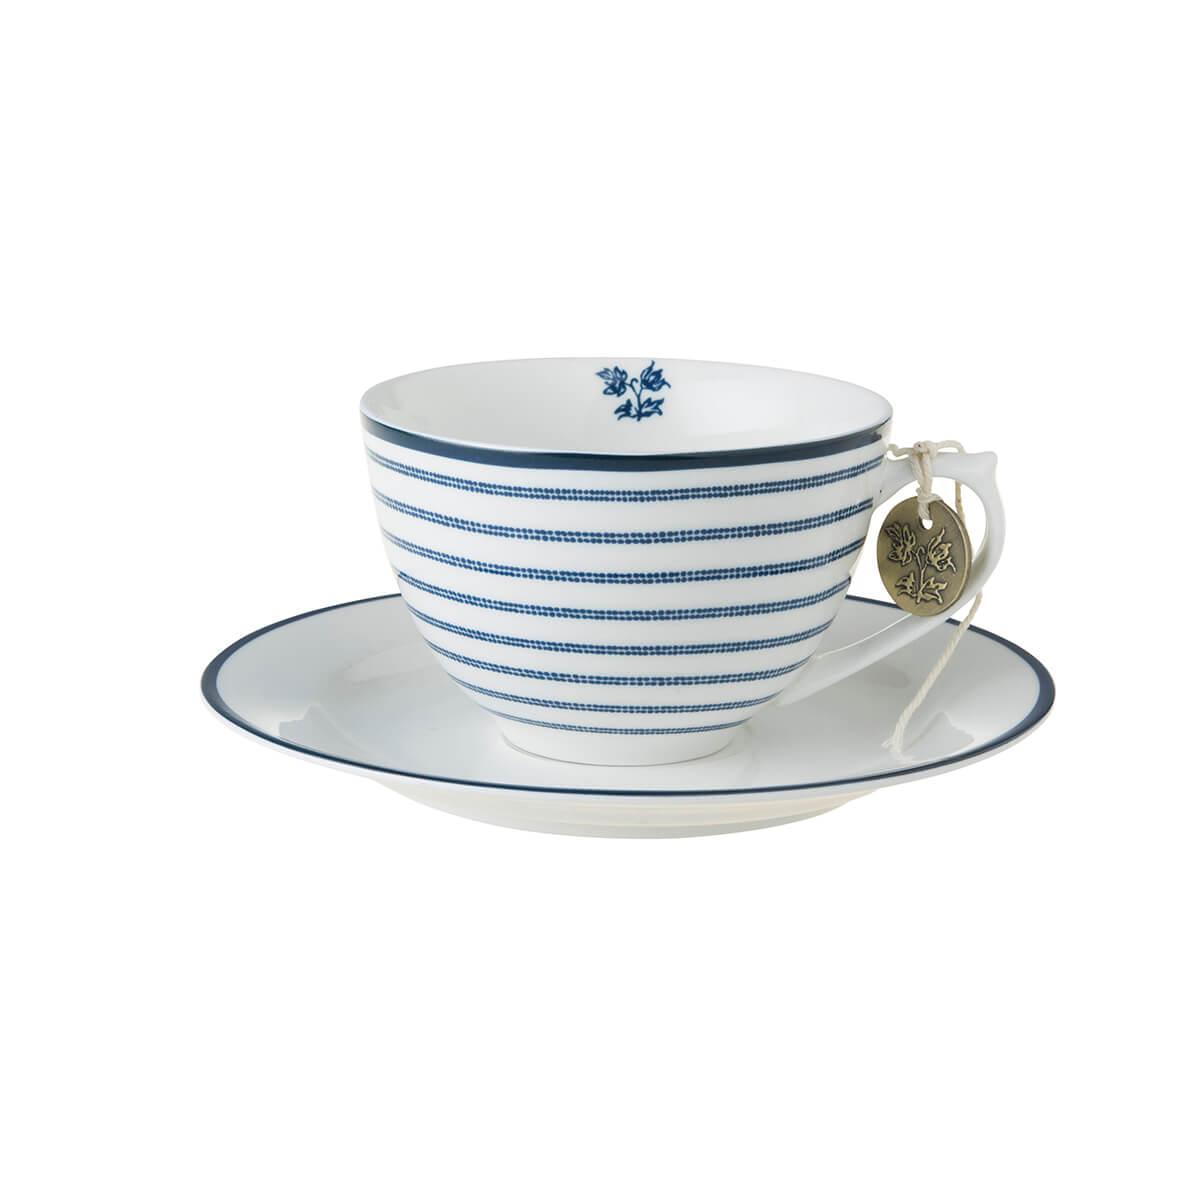 Онлайн каталог PROMENU: Набор: чашка с блюдцем Laura Ashley BLUEPRINT, 2 предмета, белый в синюю полоску Laura Ashley 178677